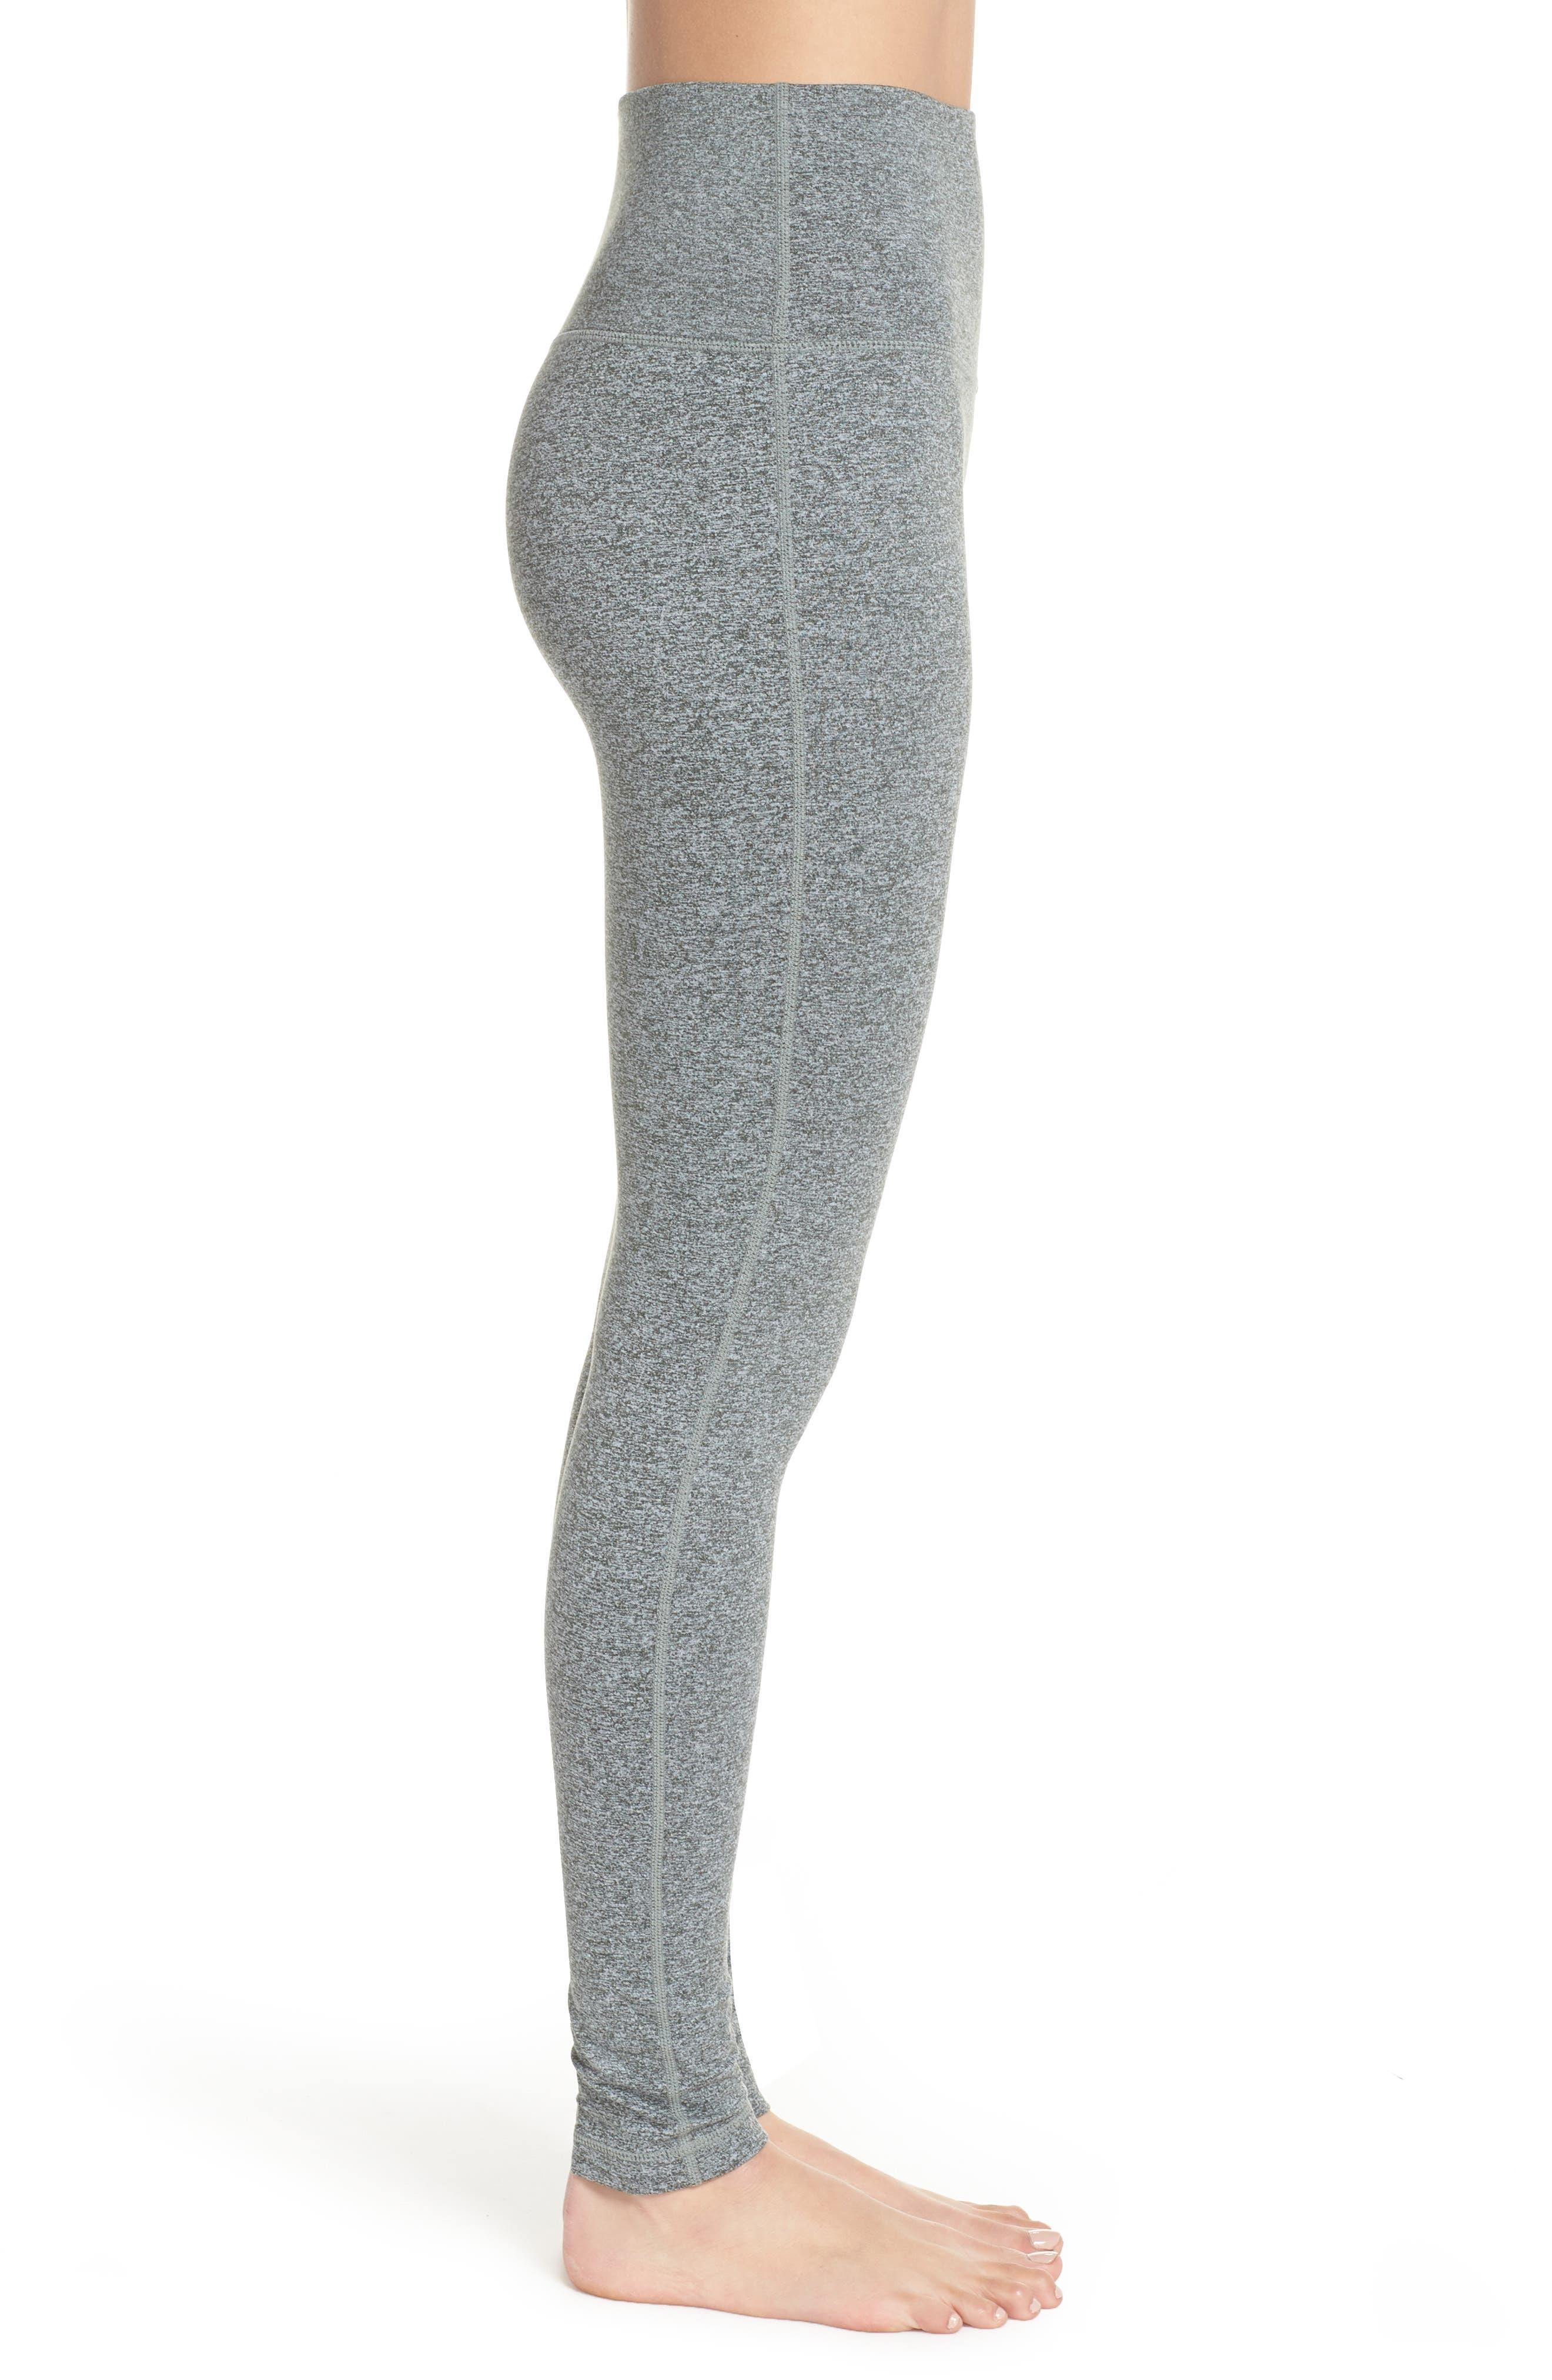 ZELLA, Ultrasoft Recycled High Waist Leggings, Alternate thumbnail 4, color, GREY URBAN